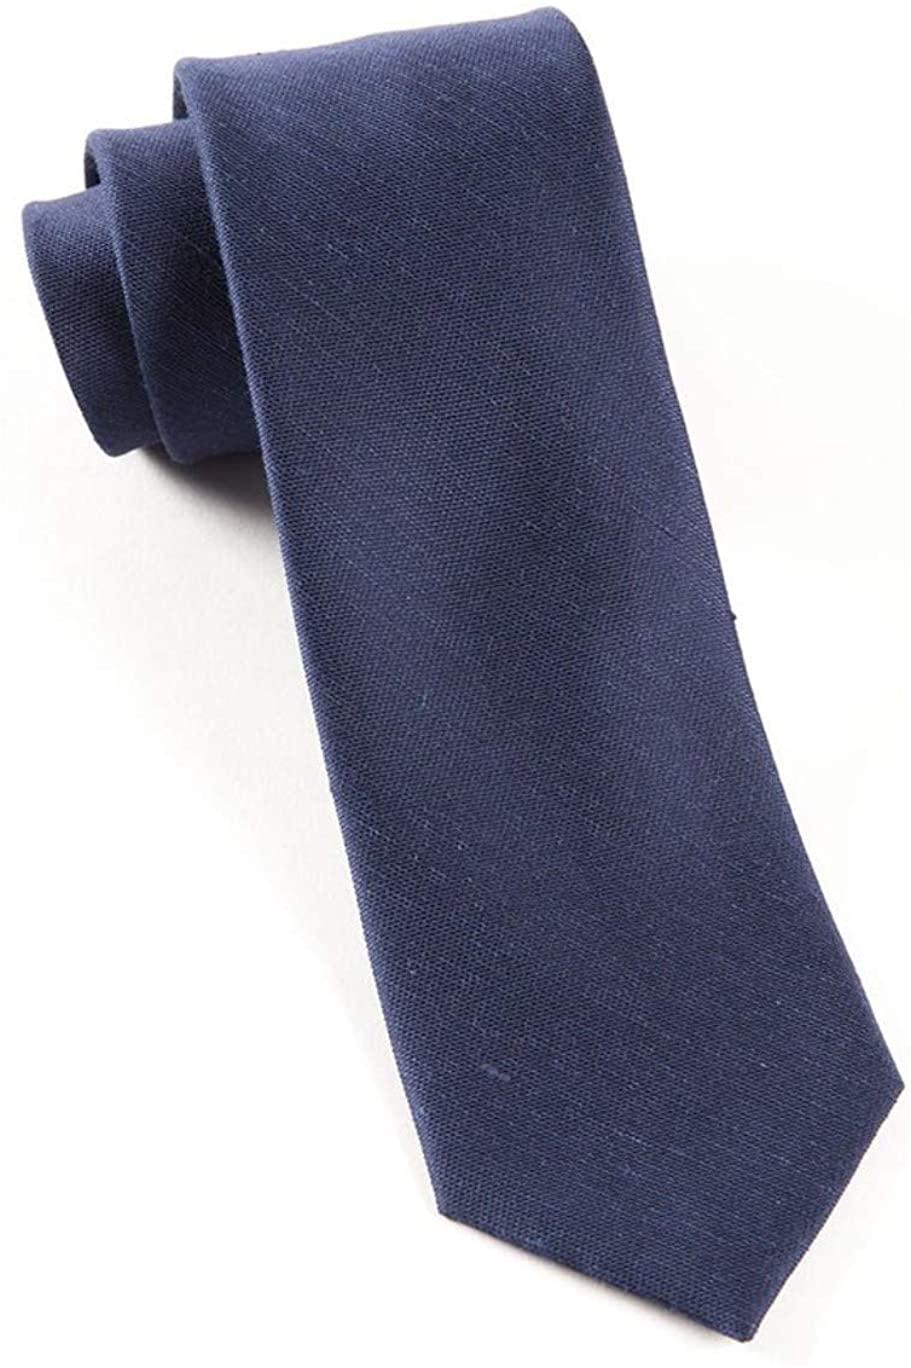 Sand Wash Solid Linen Blend Tie